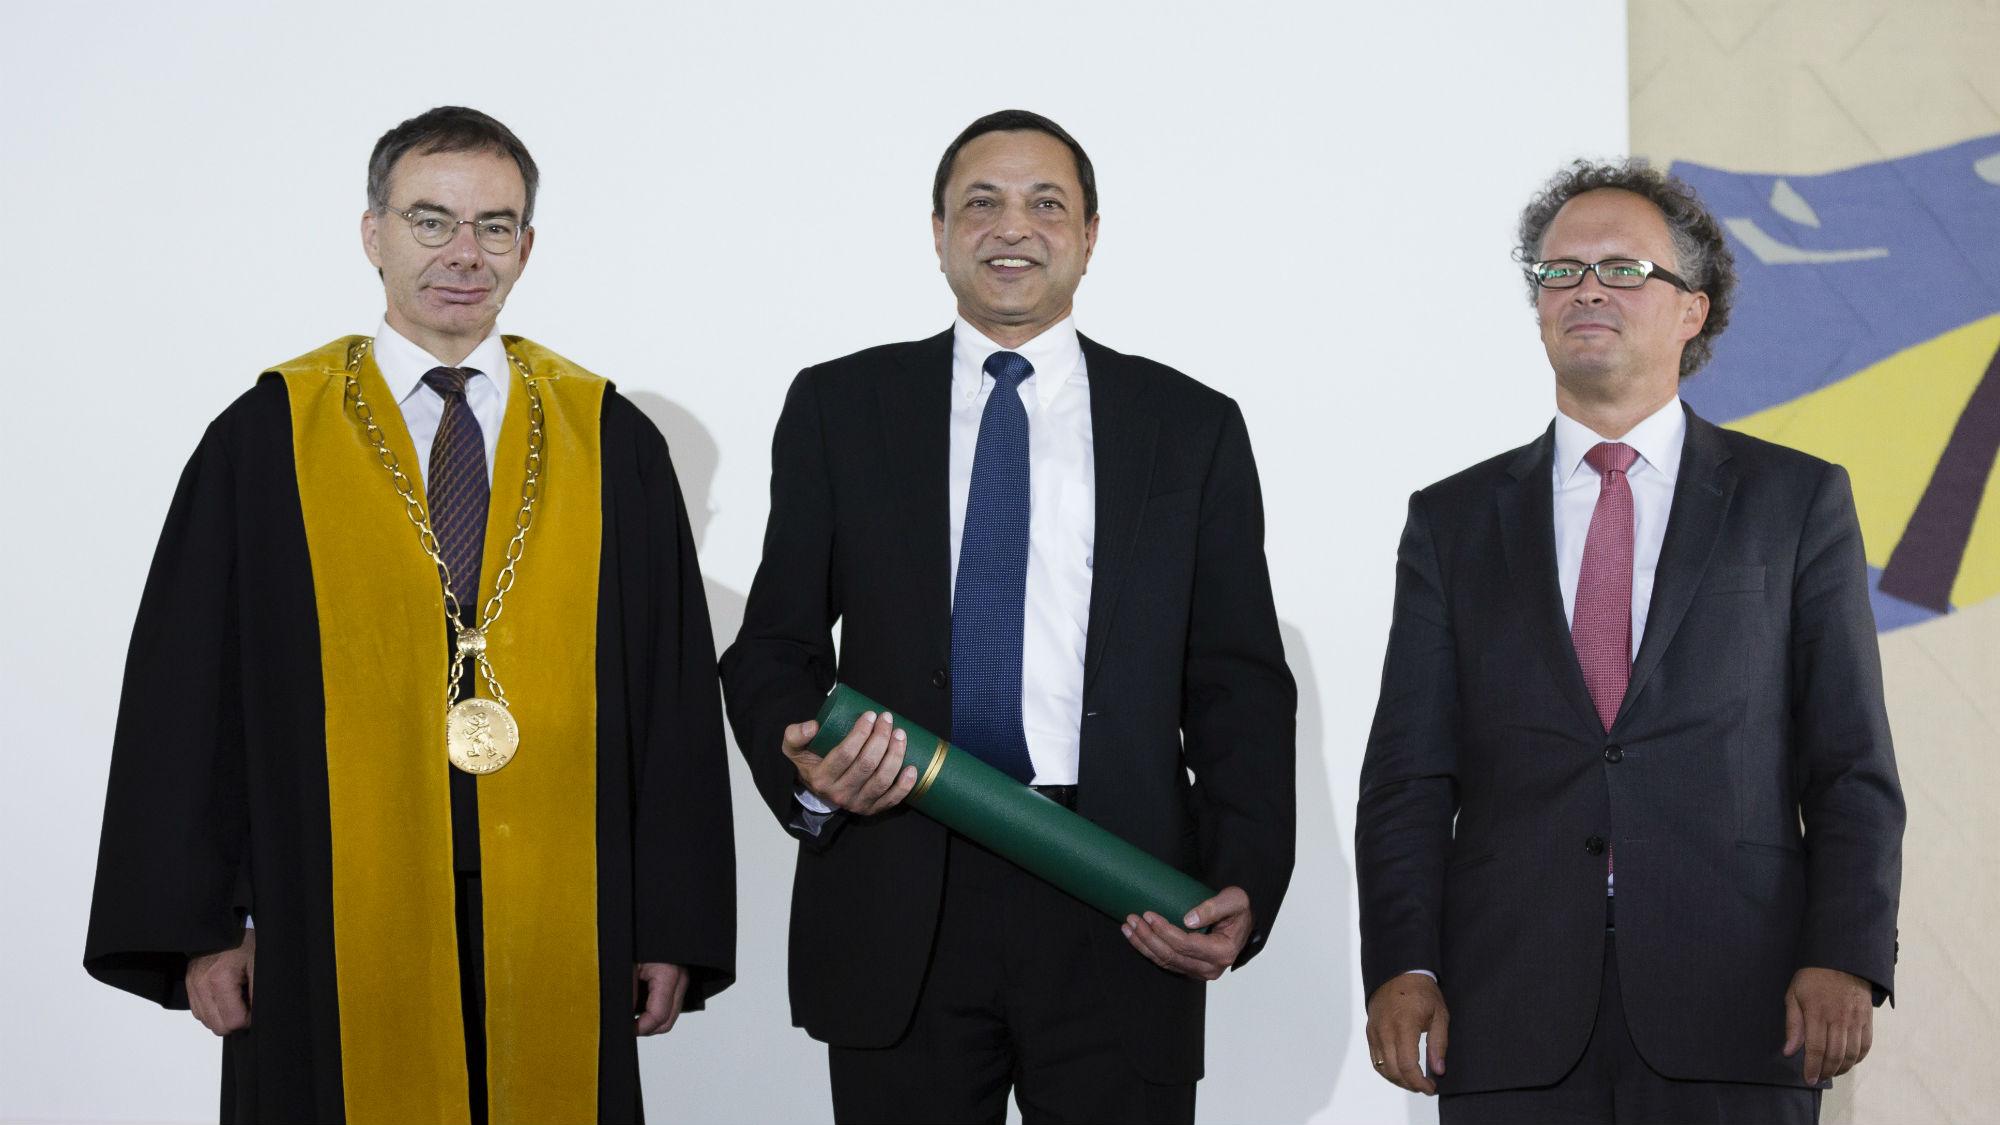 Ajaj Kohli Übergabe Ehrendoktorat 2016